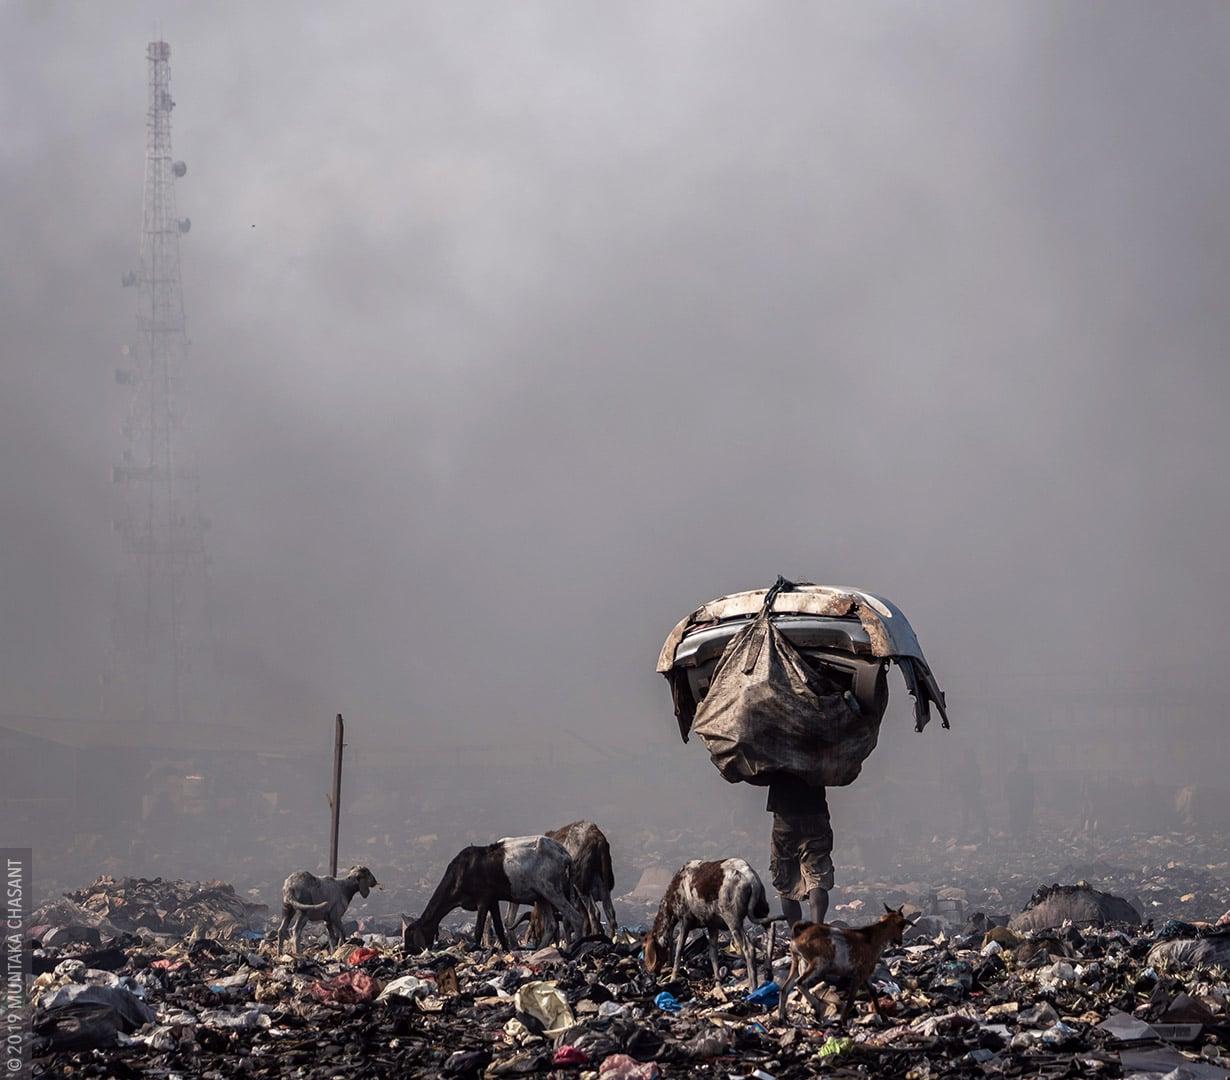 Agbogbloshie, Ghana Photo by Muntaka Chasant